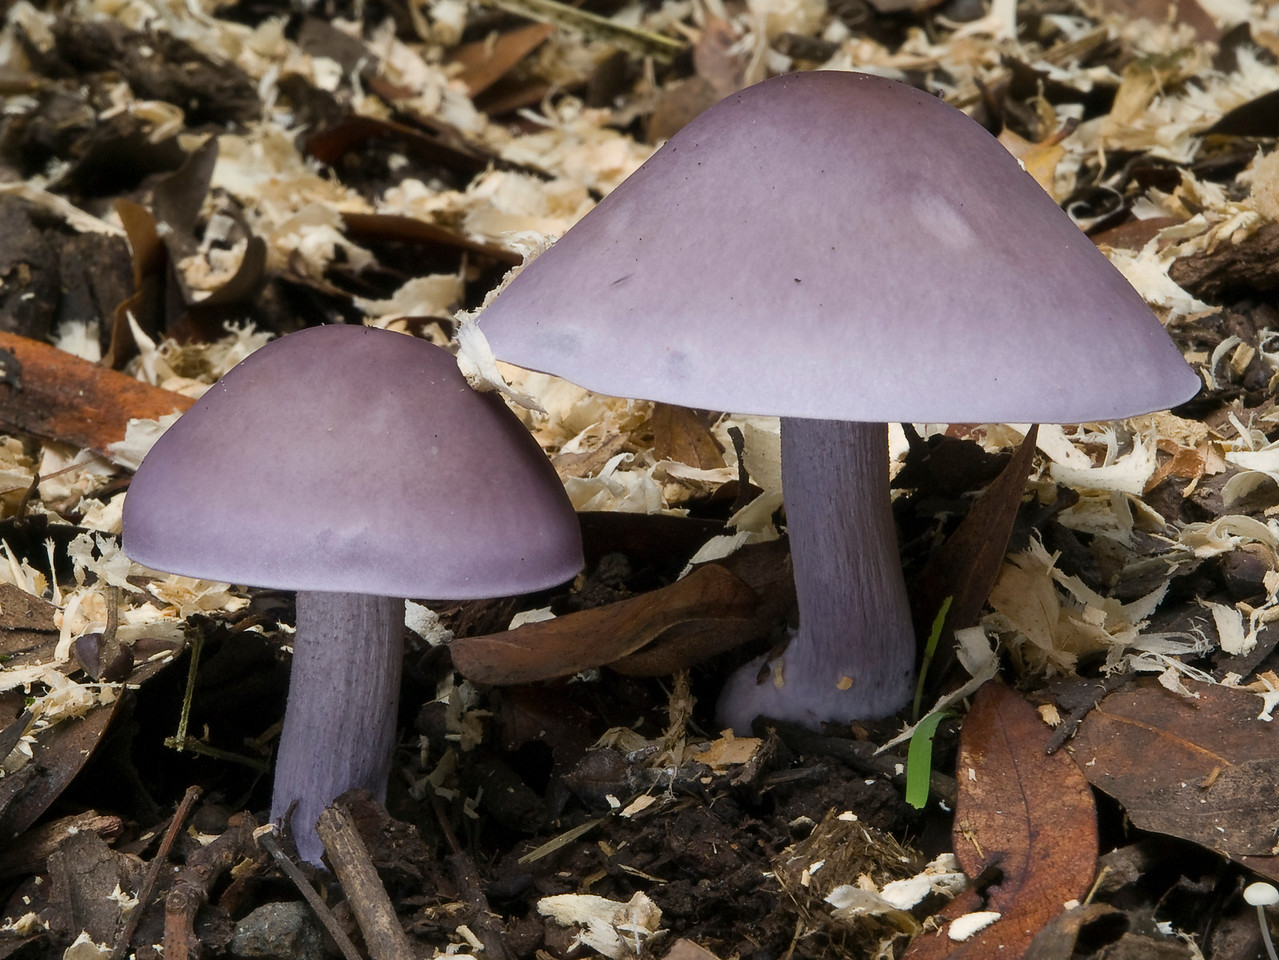 Cortinarius?  Clitocybe nuda (blewit)?